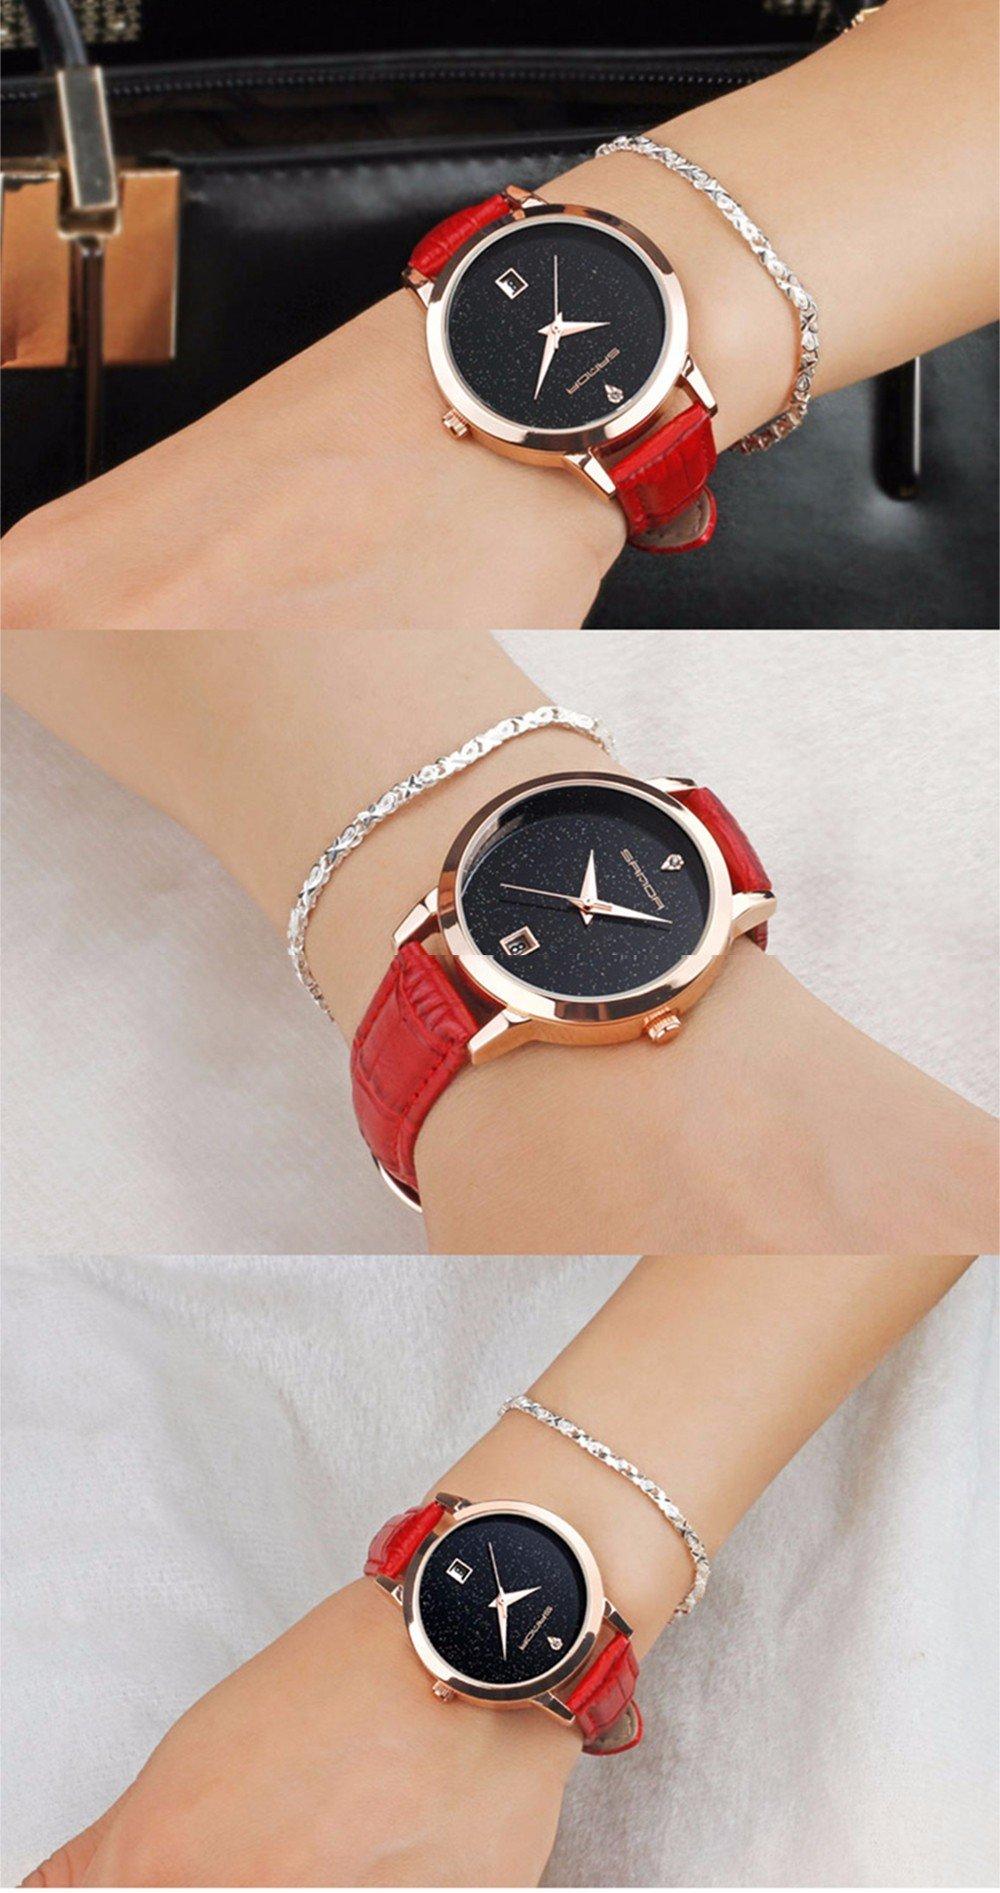 Zegarek Sanda Jane czerwony 8